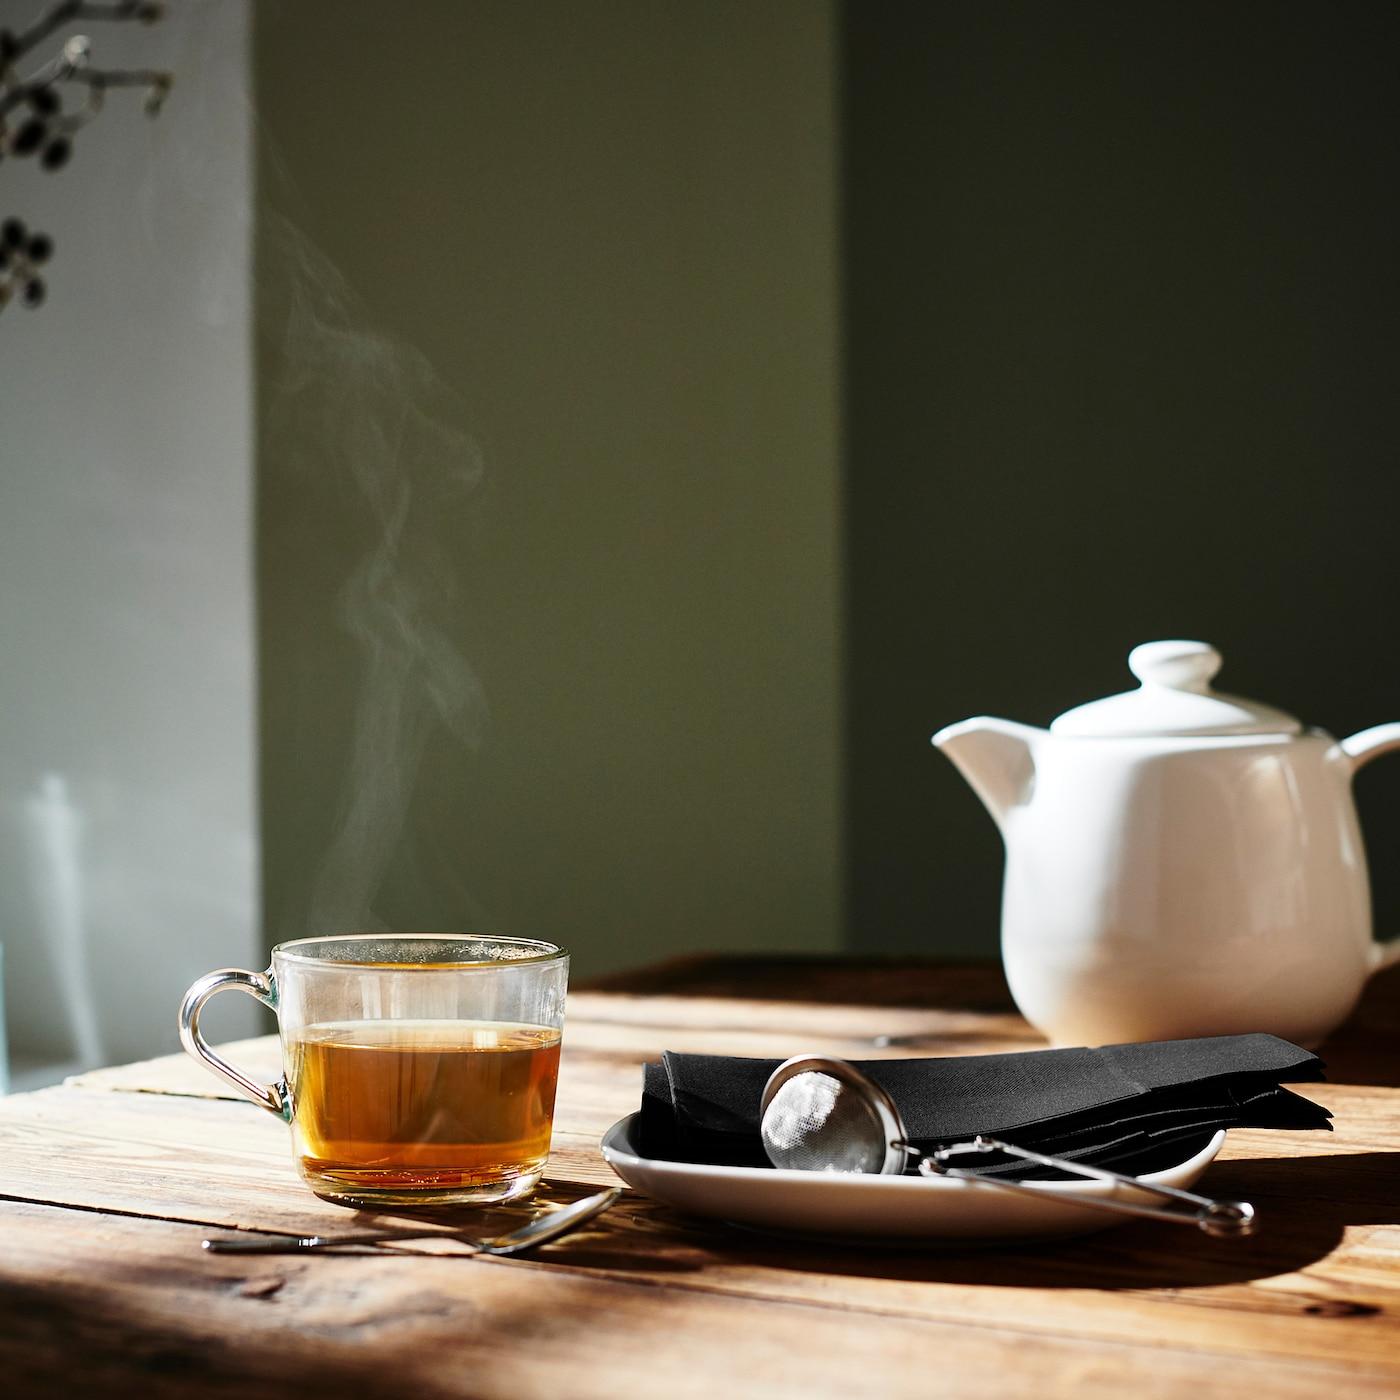 IDEALISK Tea infuser, stainless steel